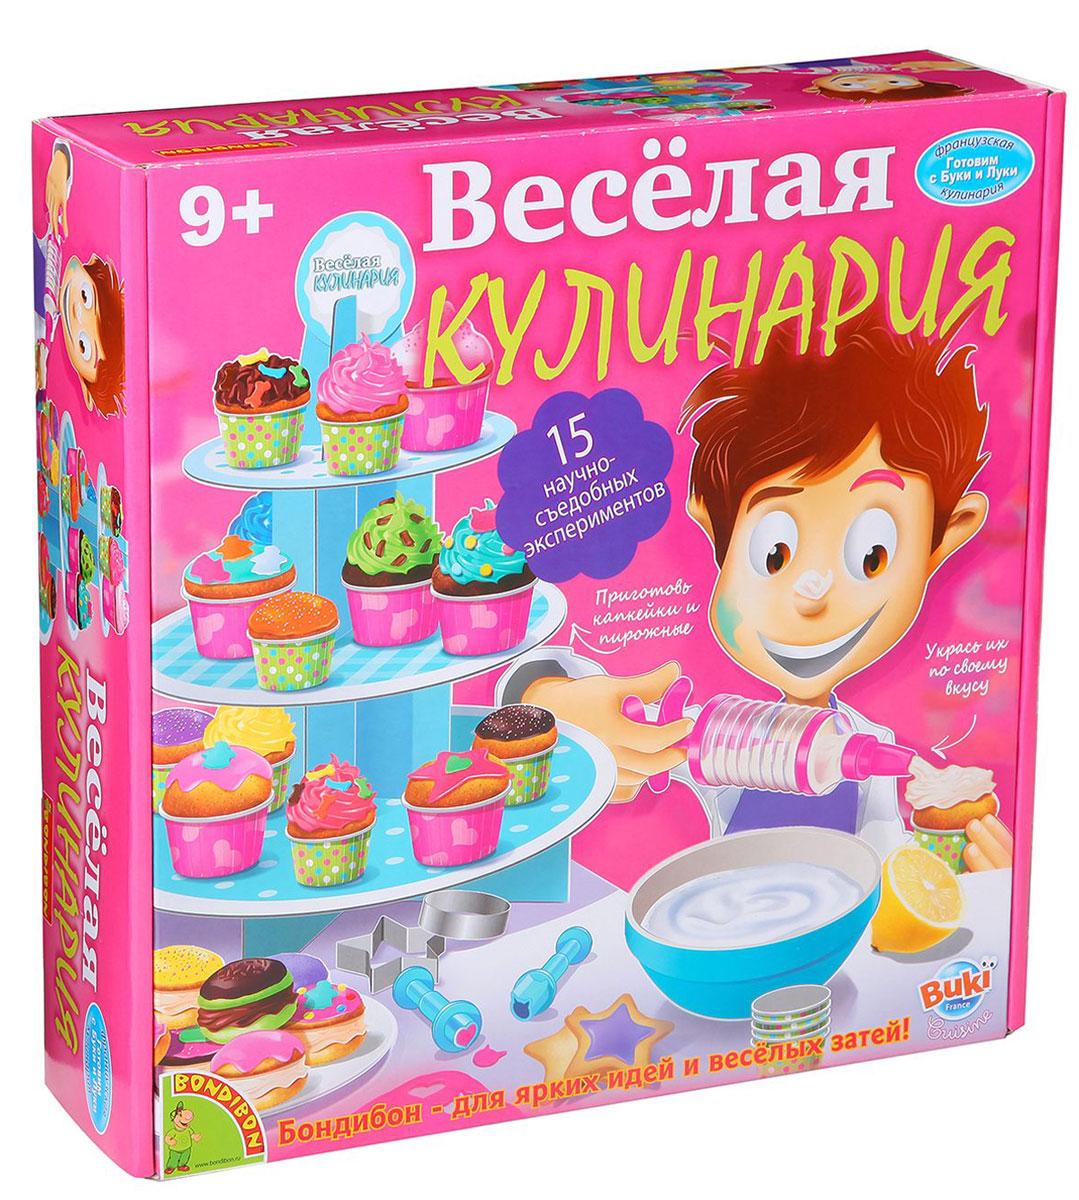 Bondibon Набор для опытов Веселая кулинария ведическая кулинария сладости выпуск 12 isbn 9785820503535